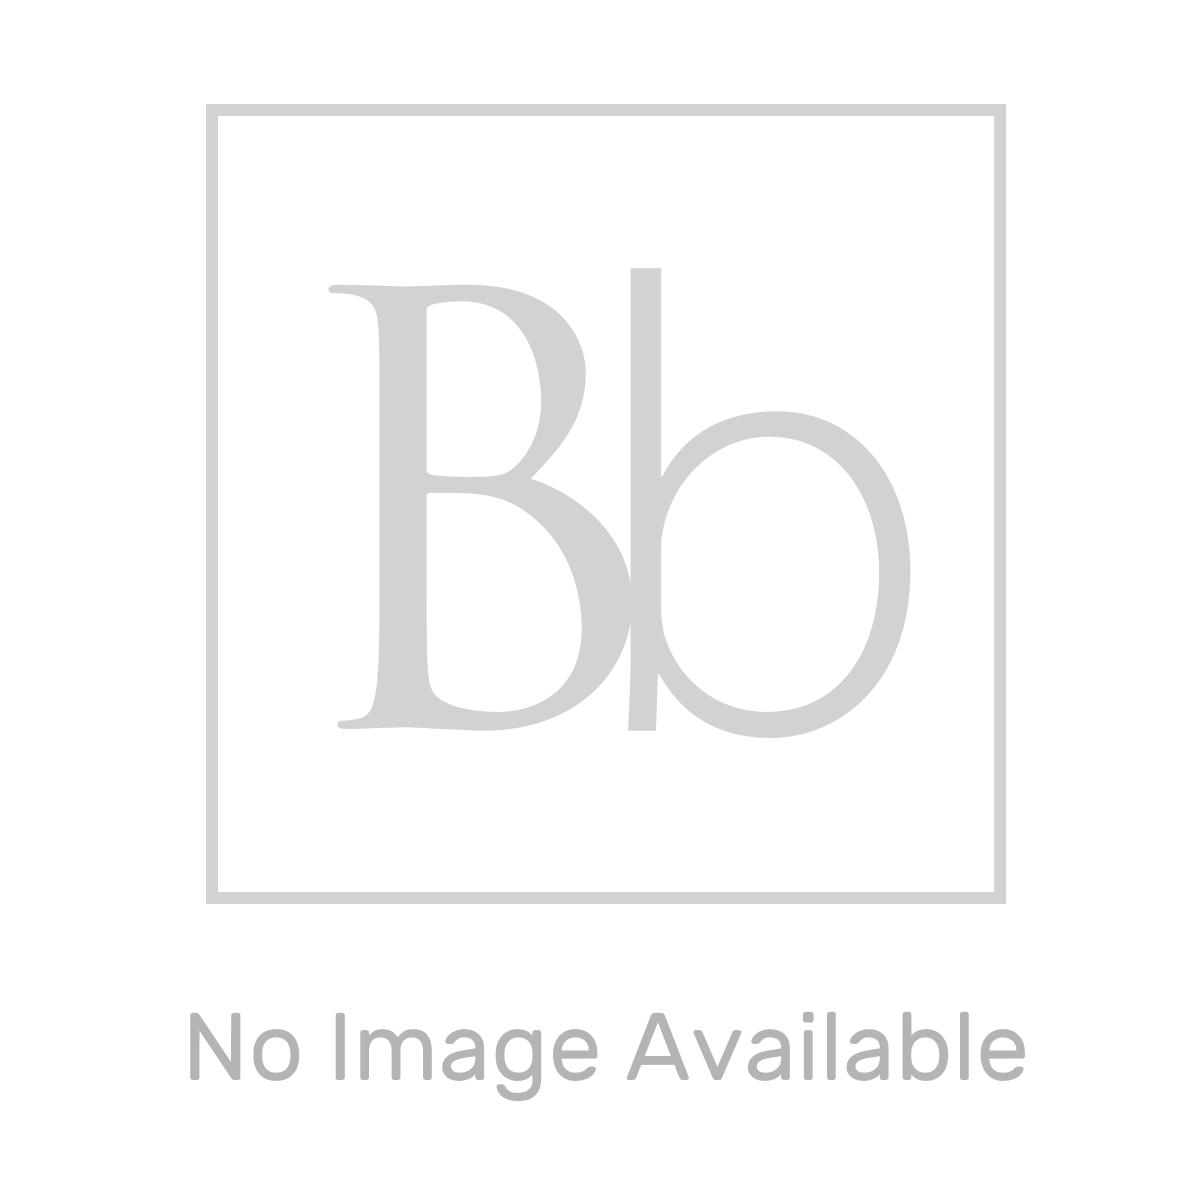 Ceramic 18mm Profile Basin